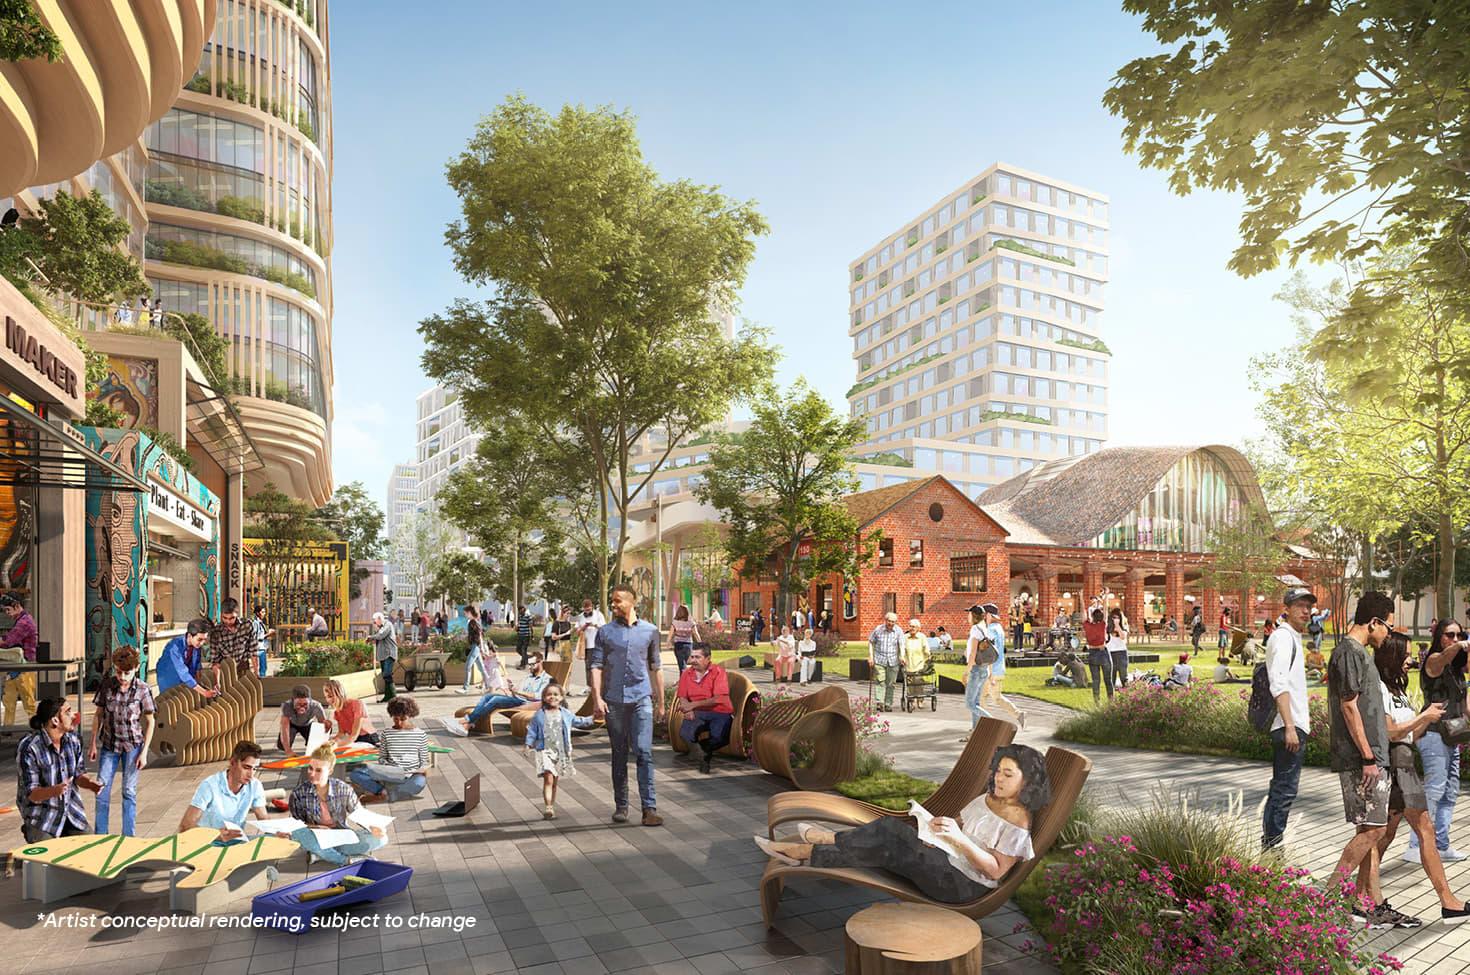 Google gets the green light to build multi-billion dollar megacampus in San Jose